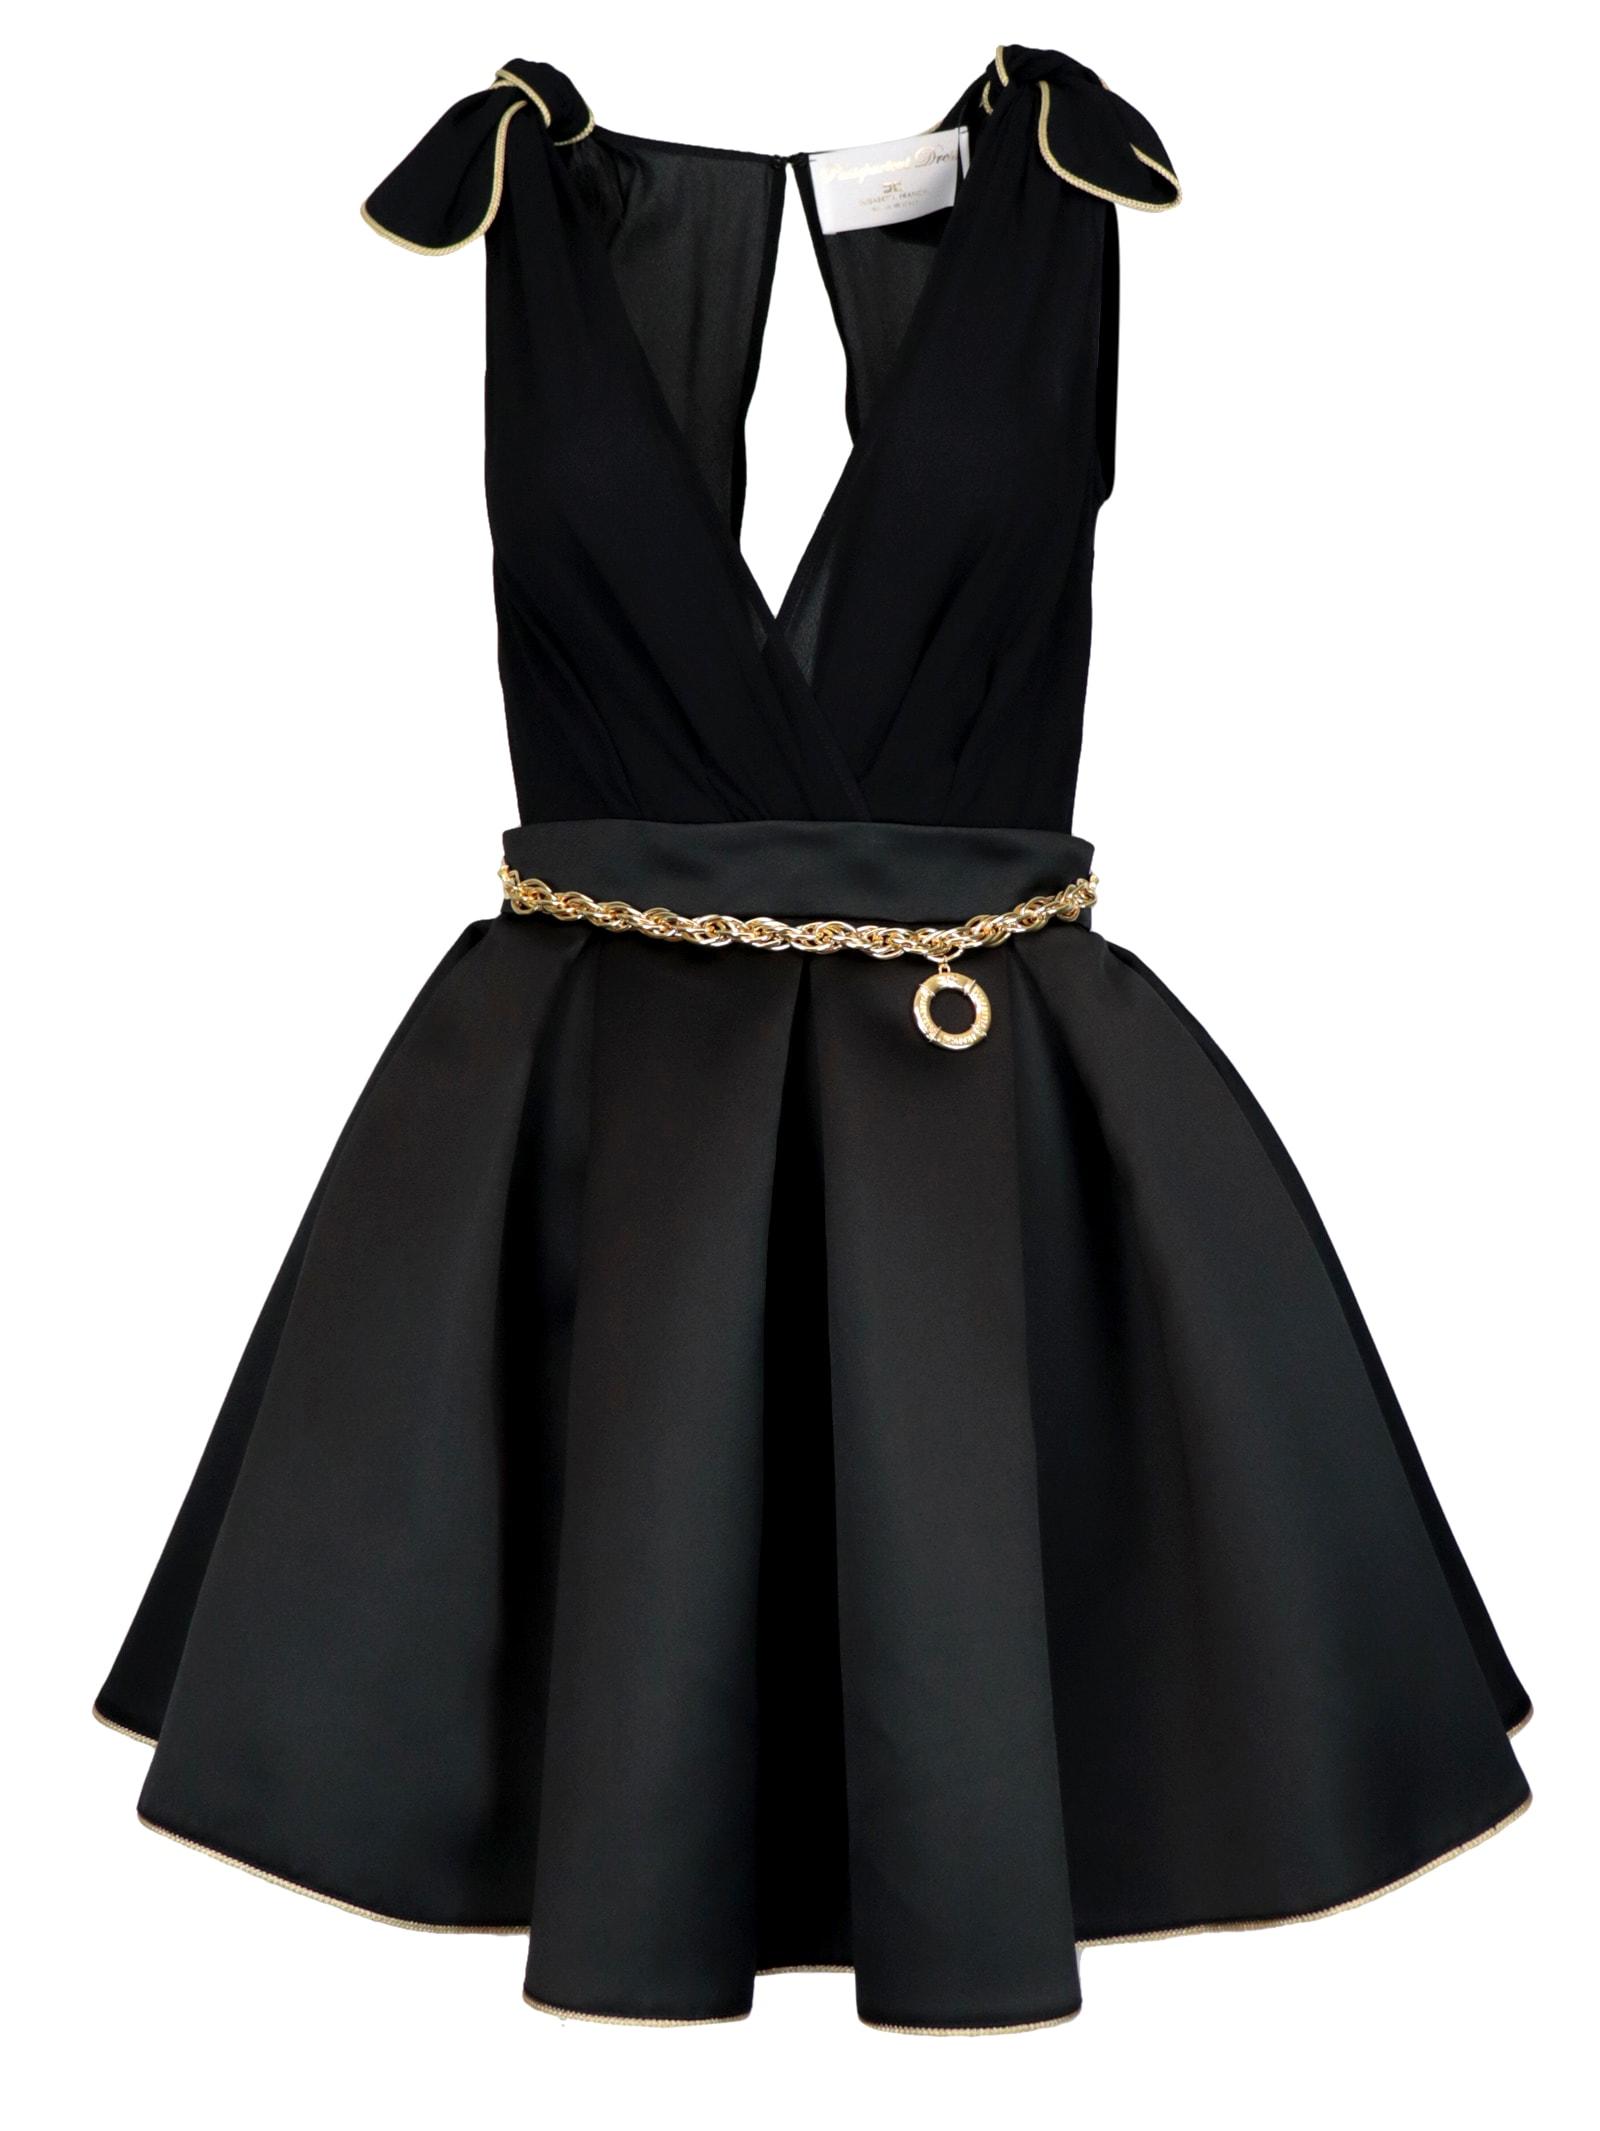 Buy Elisabetta Franchi Celyn B. Mini In Duchesse Dress online, shop Elisabetta Franchi Celyn B. with free shipping